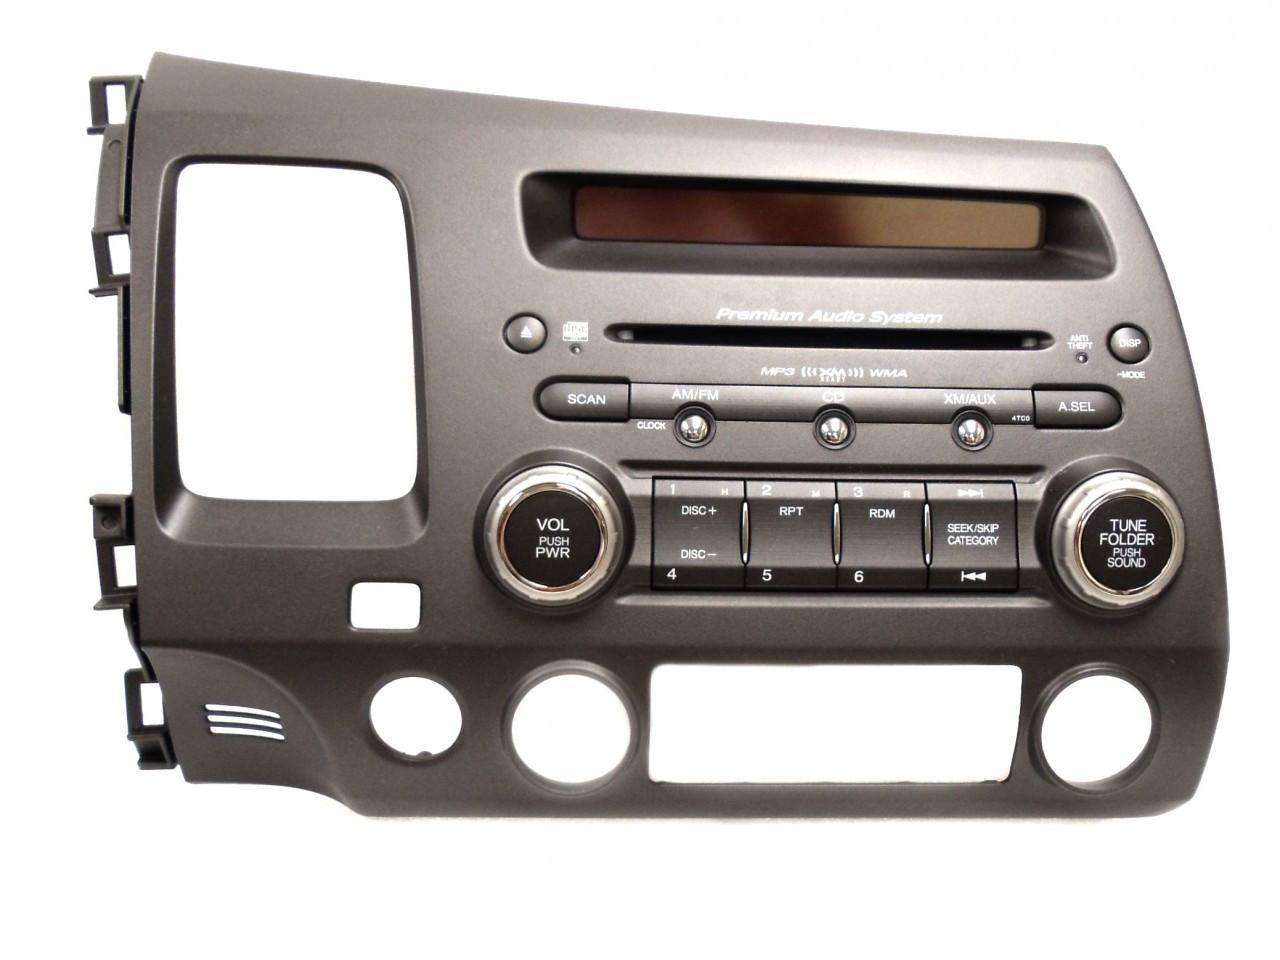 4tc0 2006 07 08 2011 honda civic radio stereo mp3 cd player. Black Bedroom Furniture Sets. Home Design Ideas